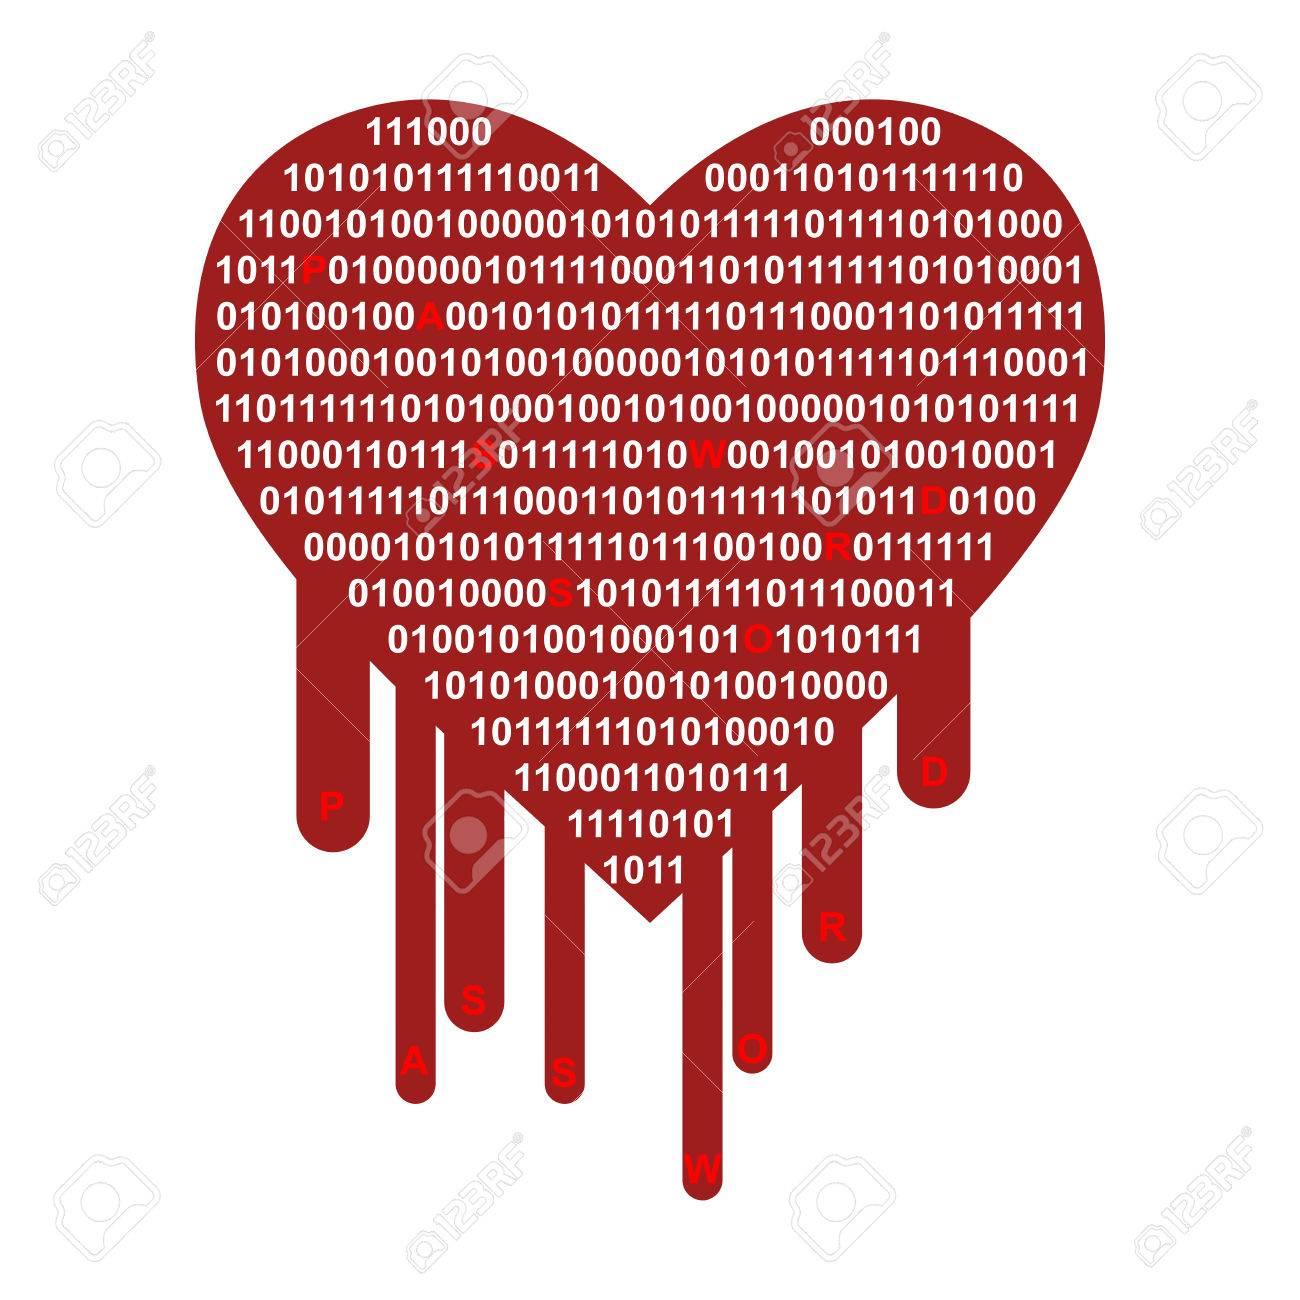 Open ssl heart bleed security breach symbol stock photo picture open ssl heart bleed security breach symbol stock photo 28871248 buycottarizona Gallery